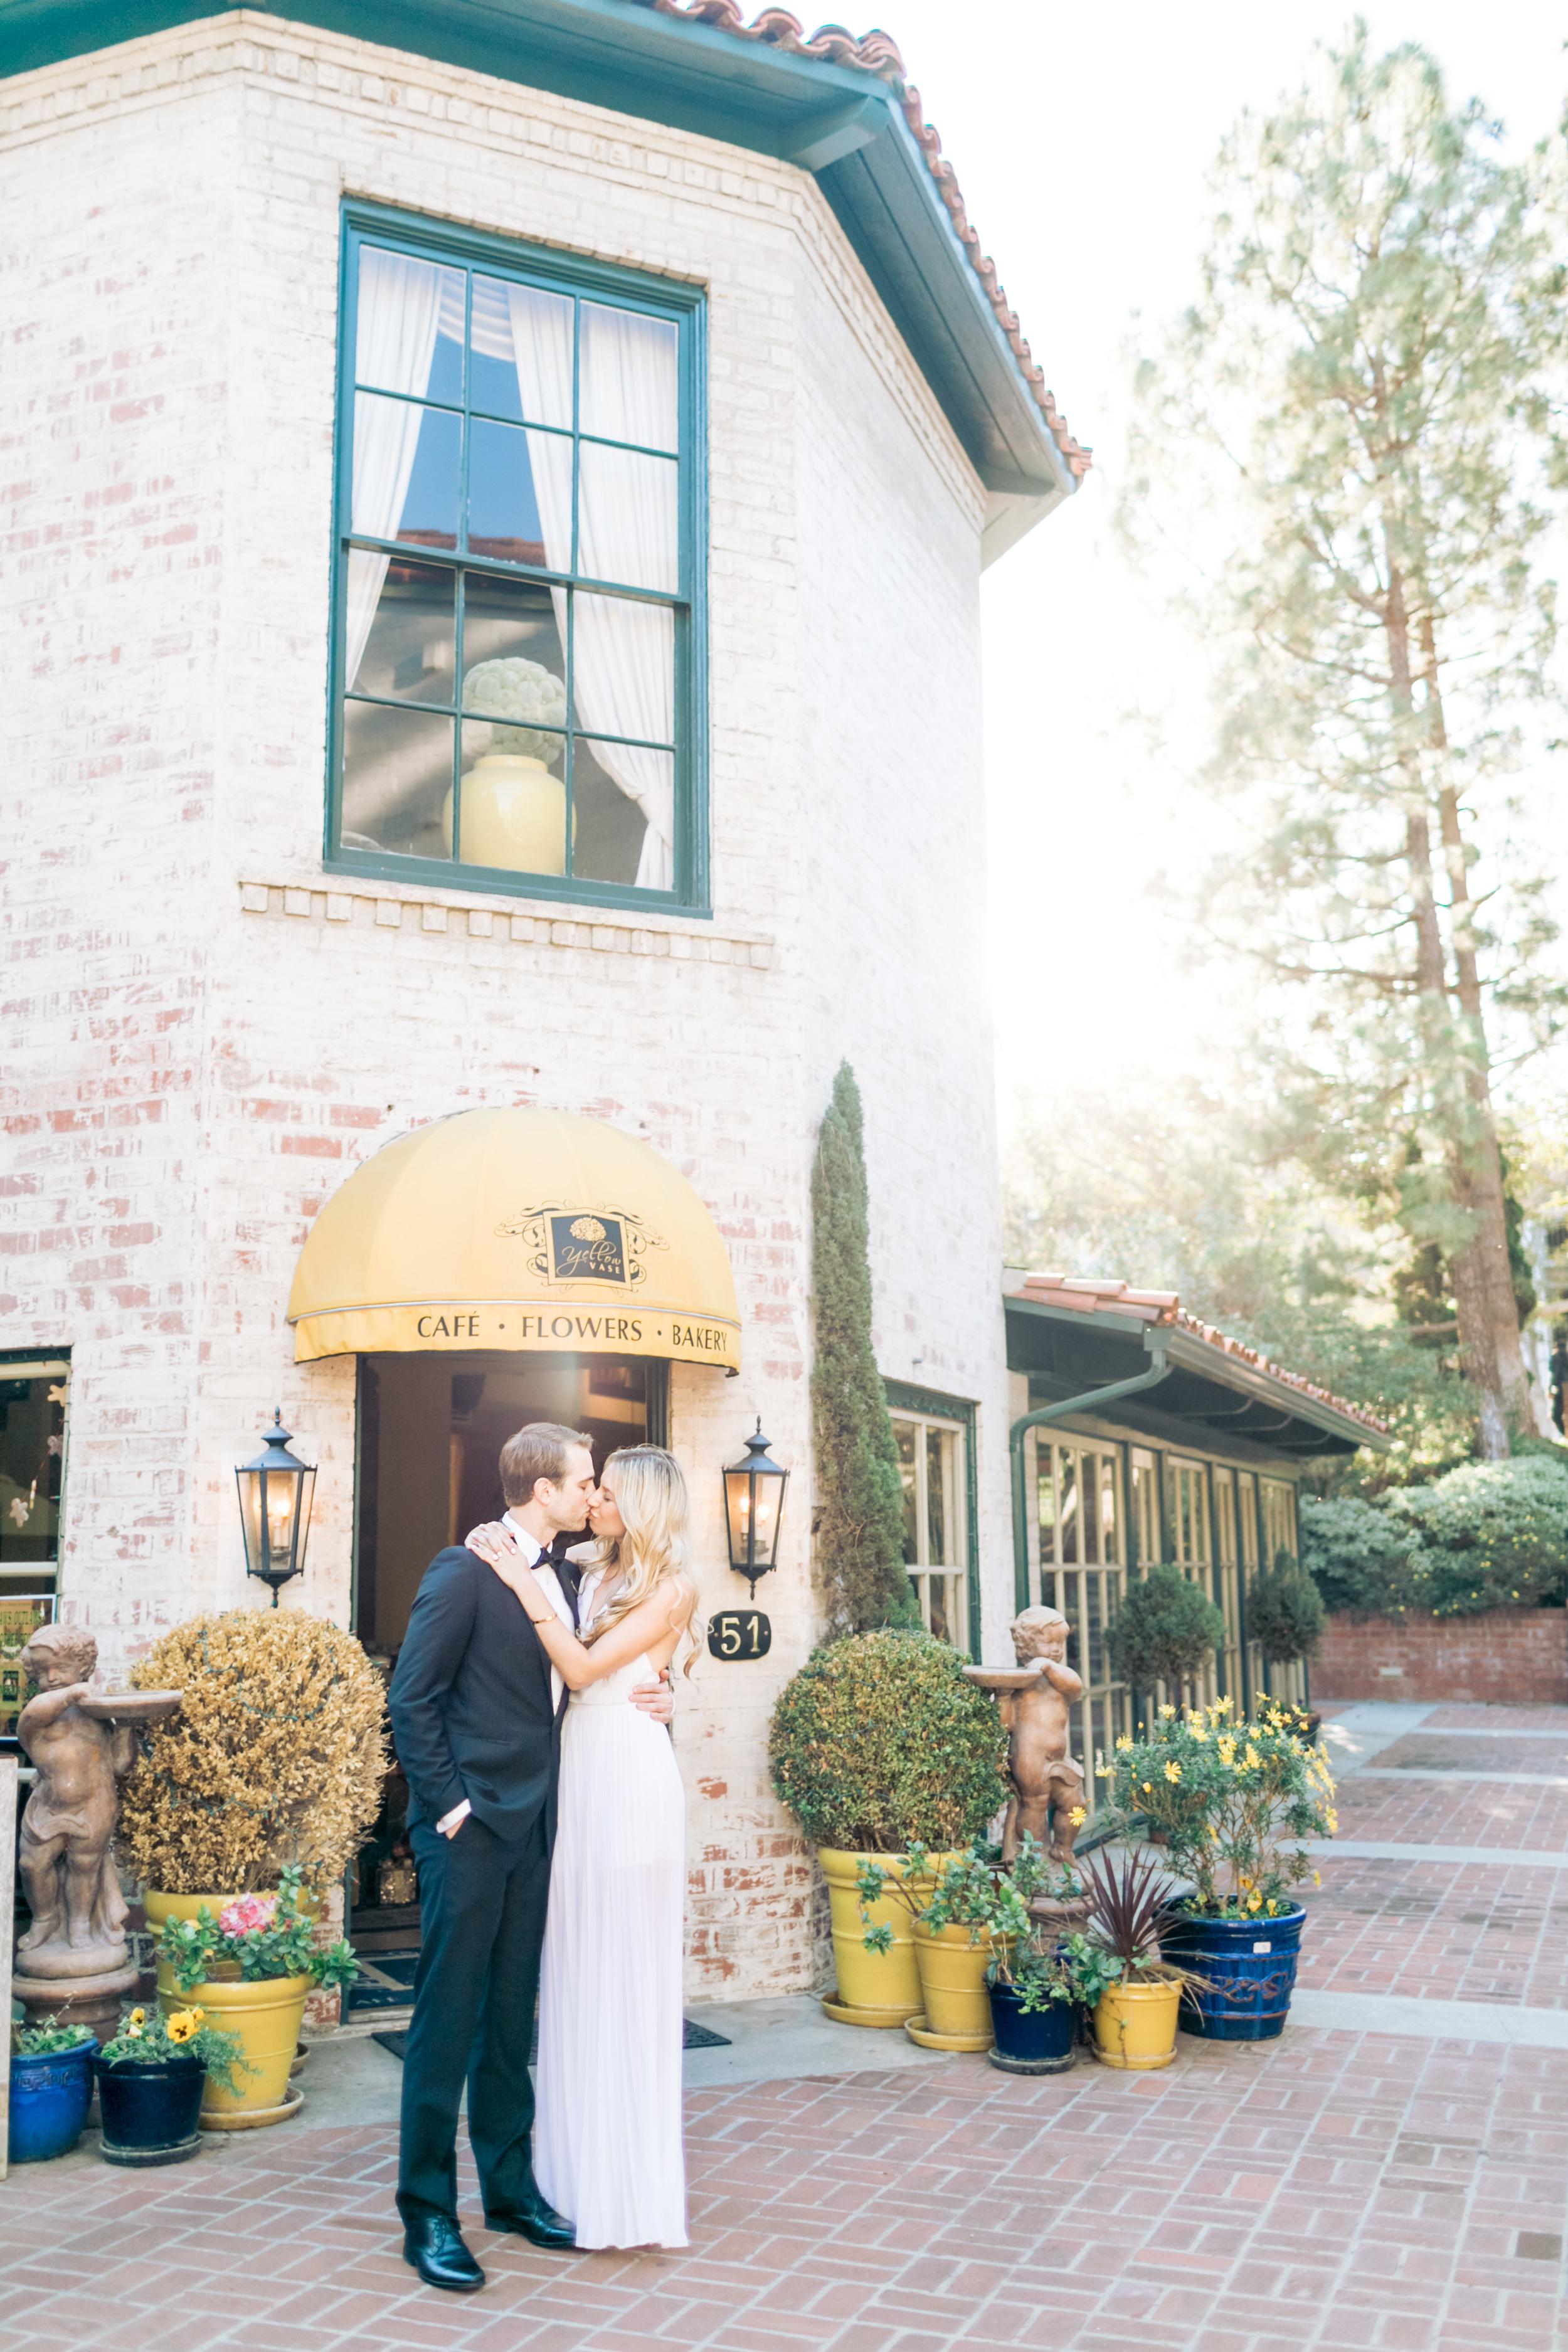 2015Natalie Schutt Photography- Palos Verdes Wedding-22.JPG